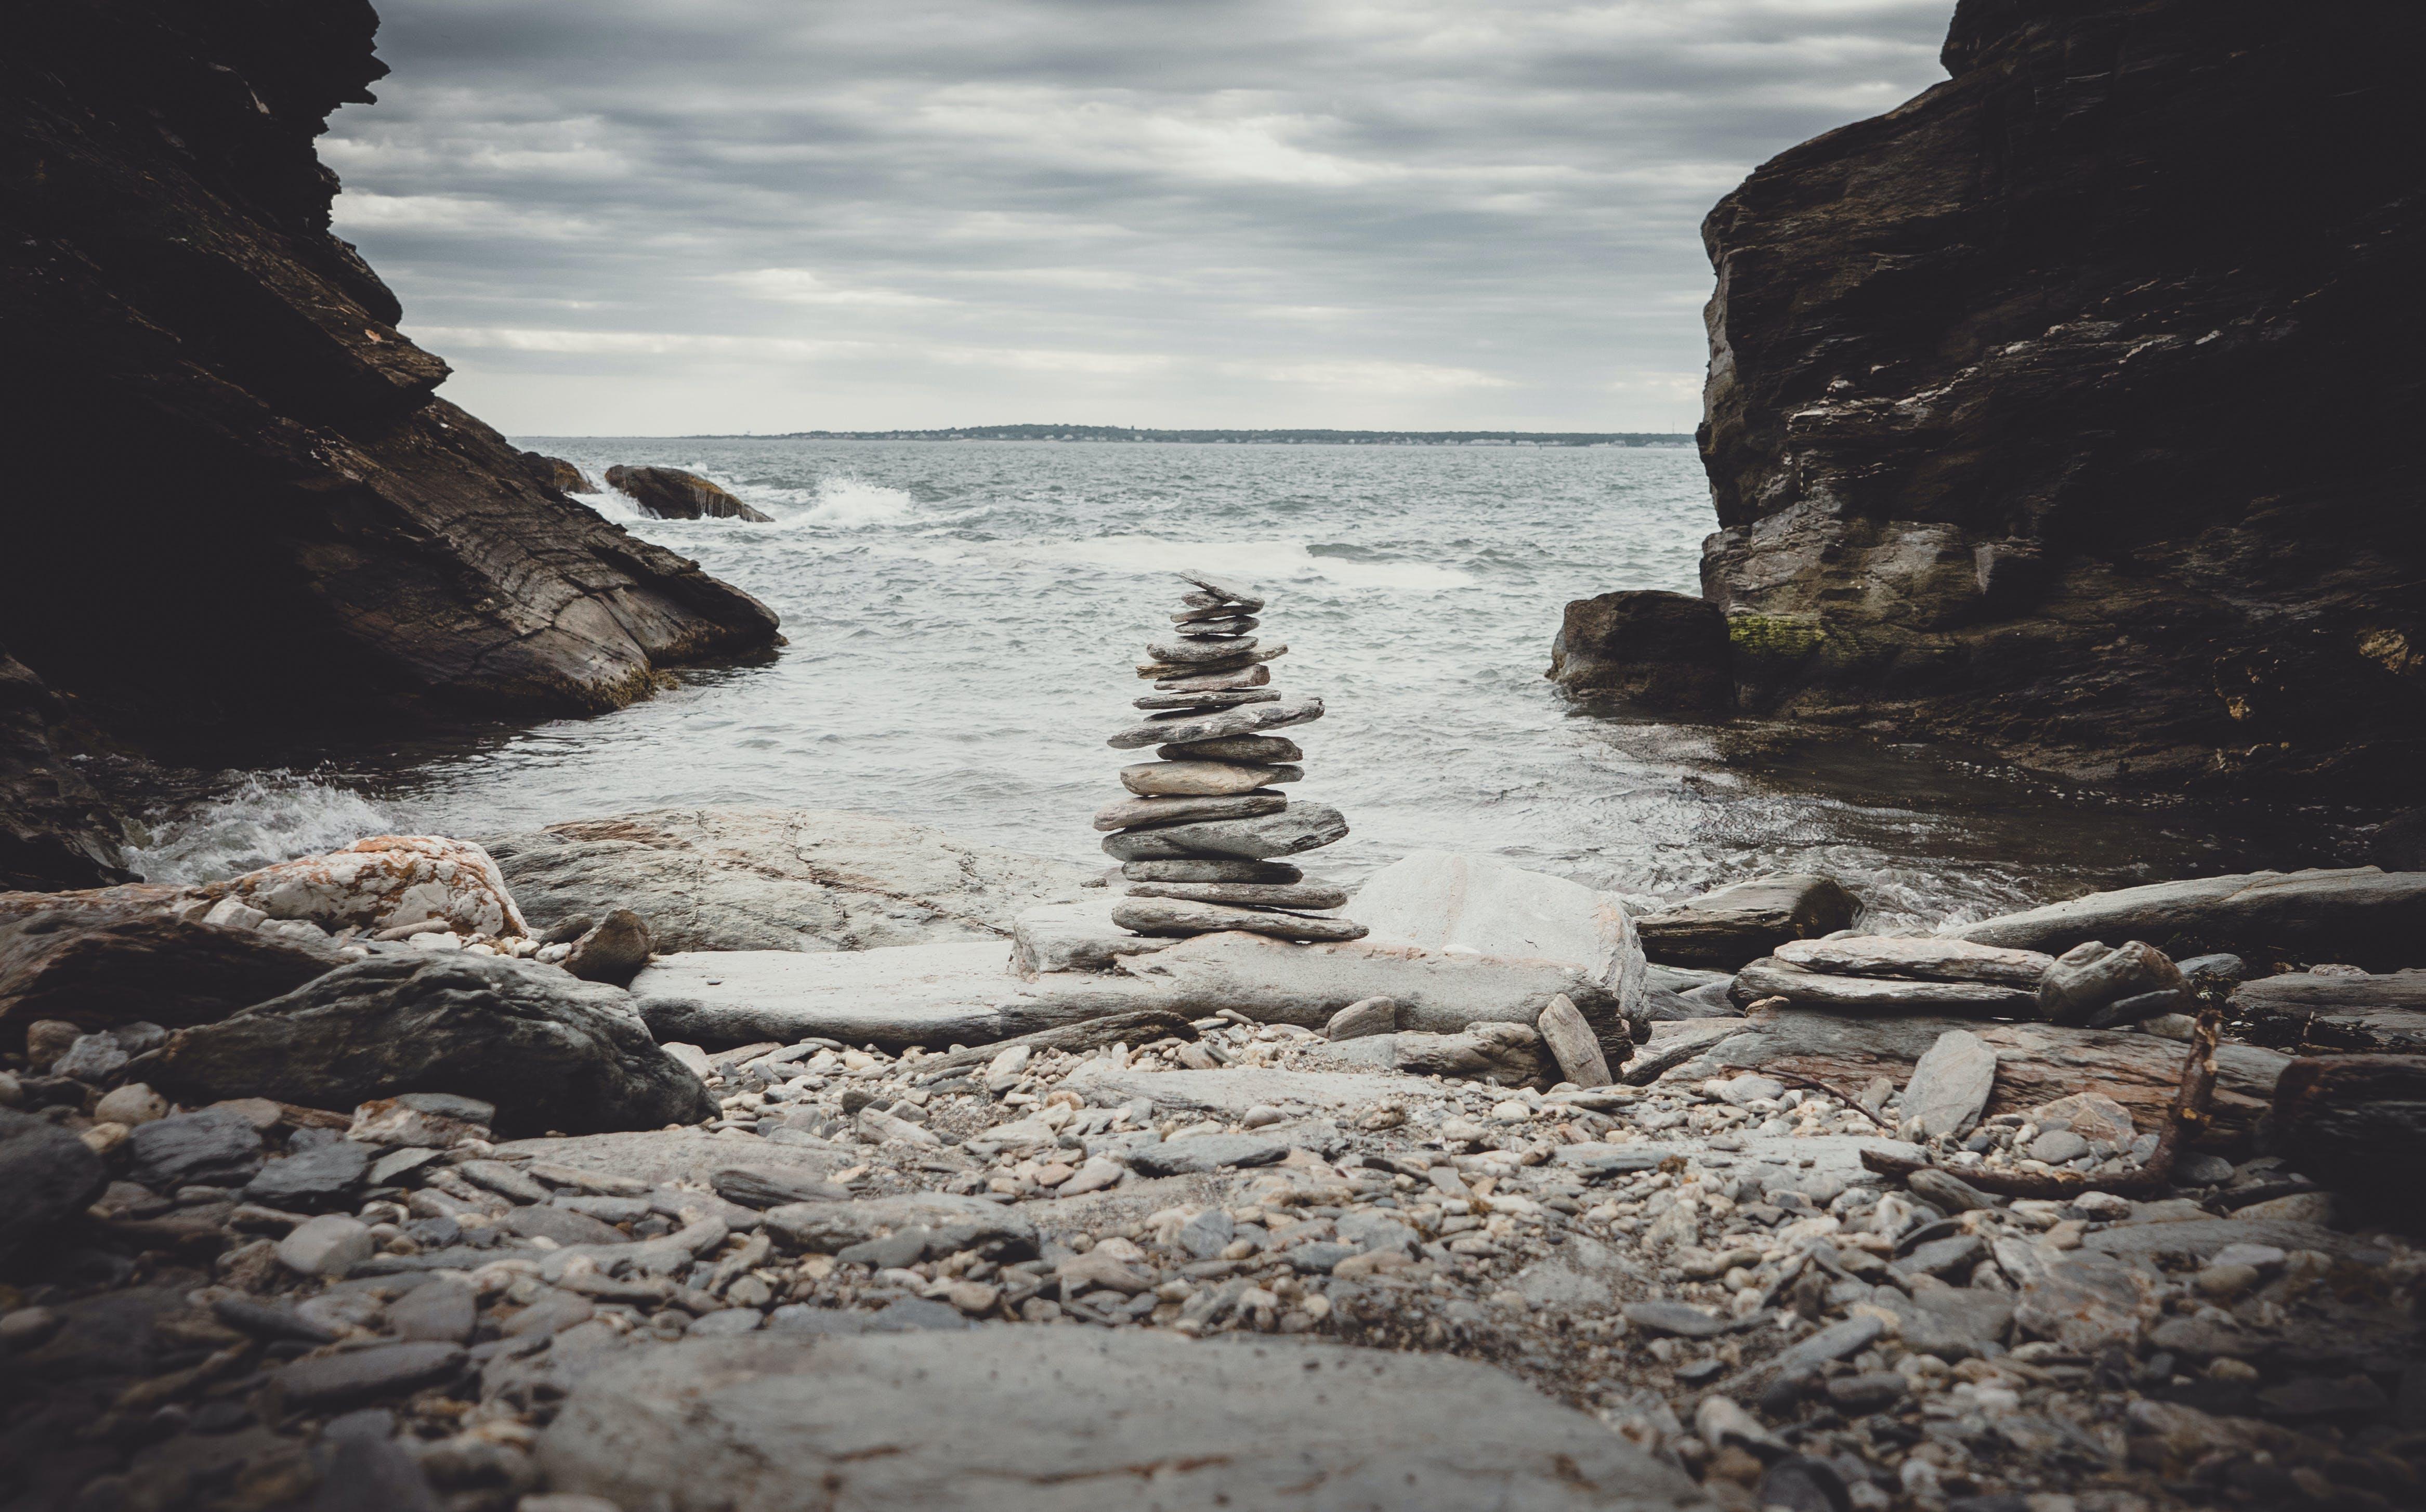 Free stock photo of landscape, ocean, rocks, photographer